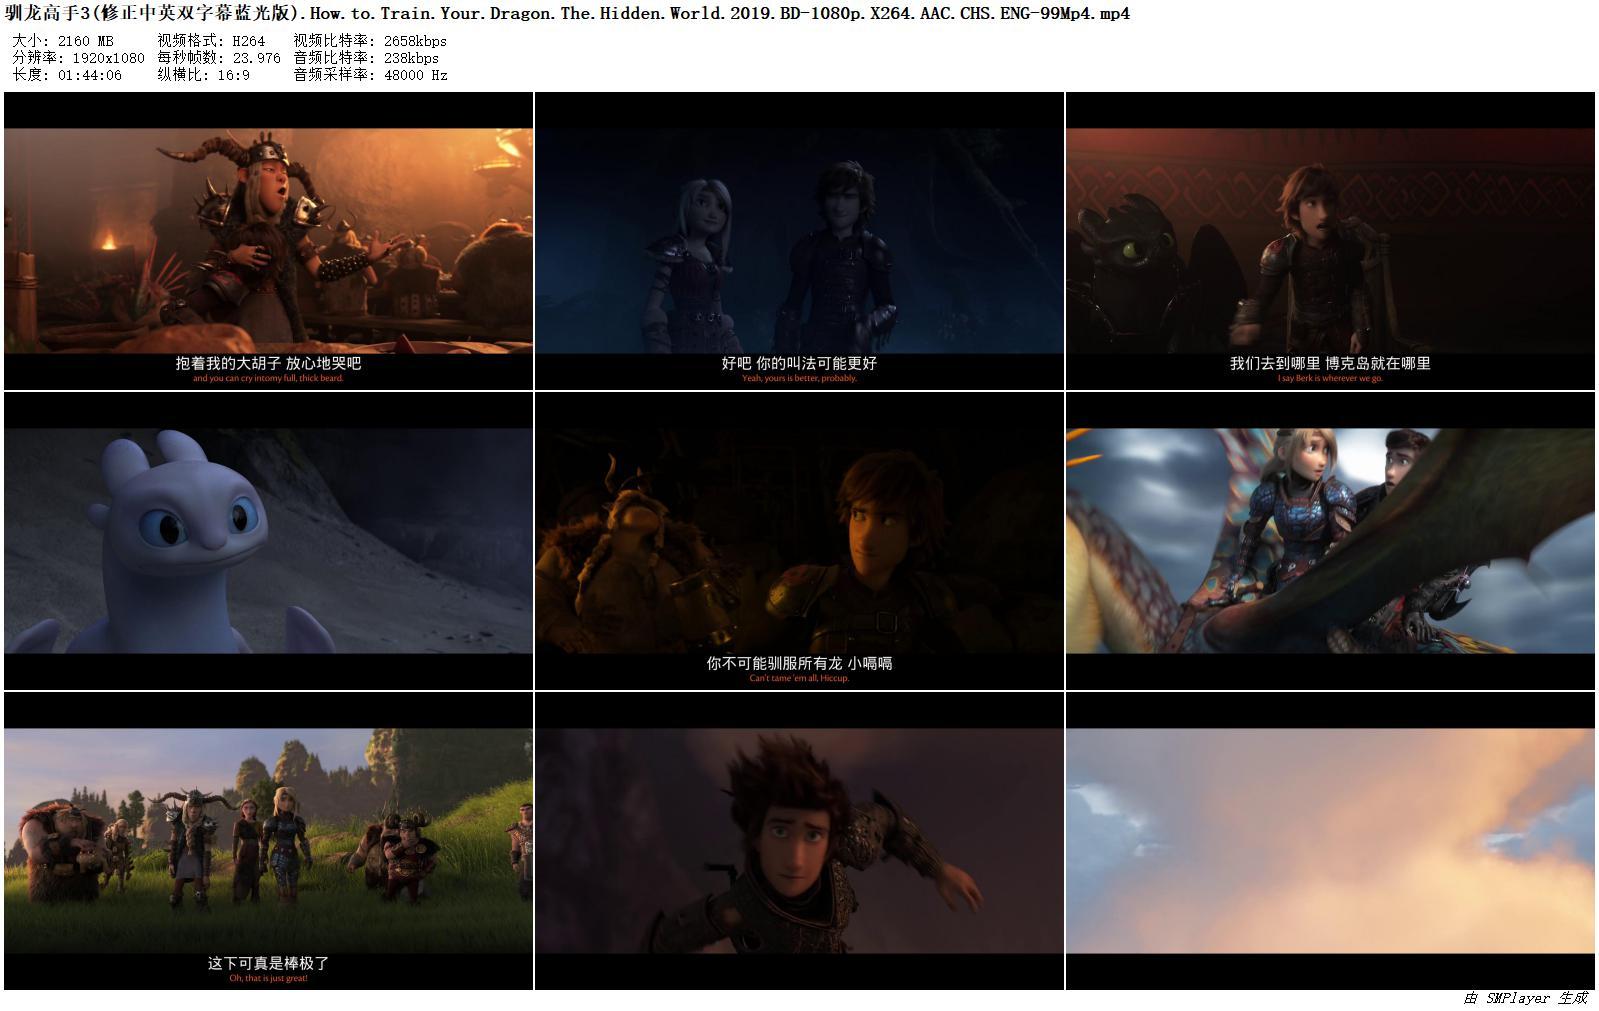 [BT下載][馴龍高手3:隱秘的世界][BD-MP4/2.1G][藍光中英雙字幕][1080P] 電影 2019 歐美 動畫 有水印